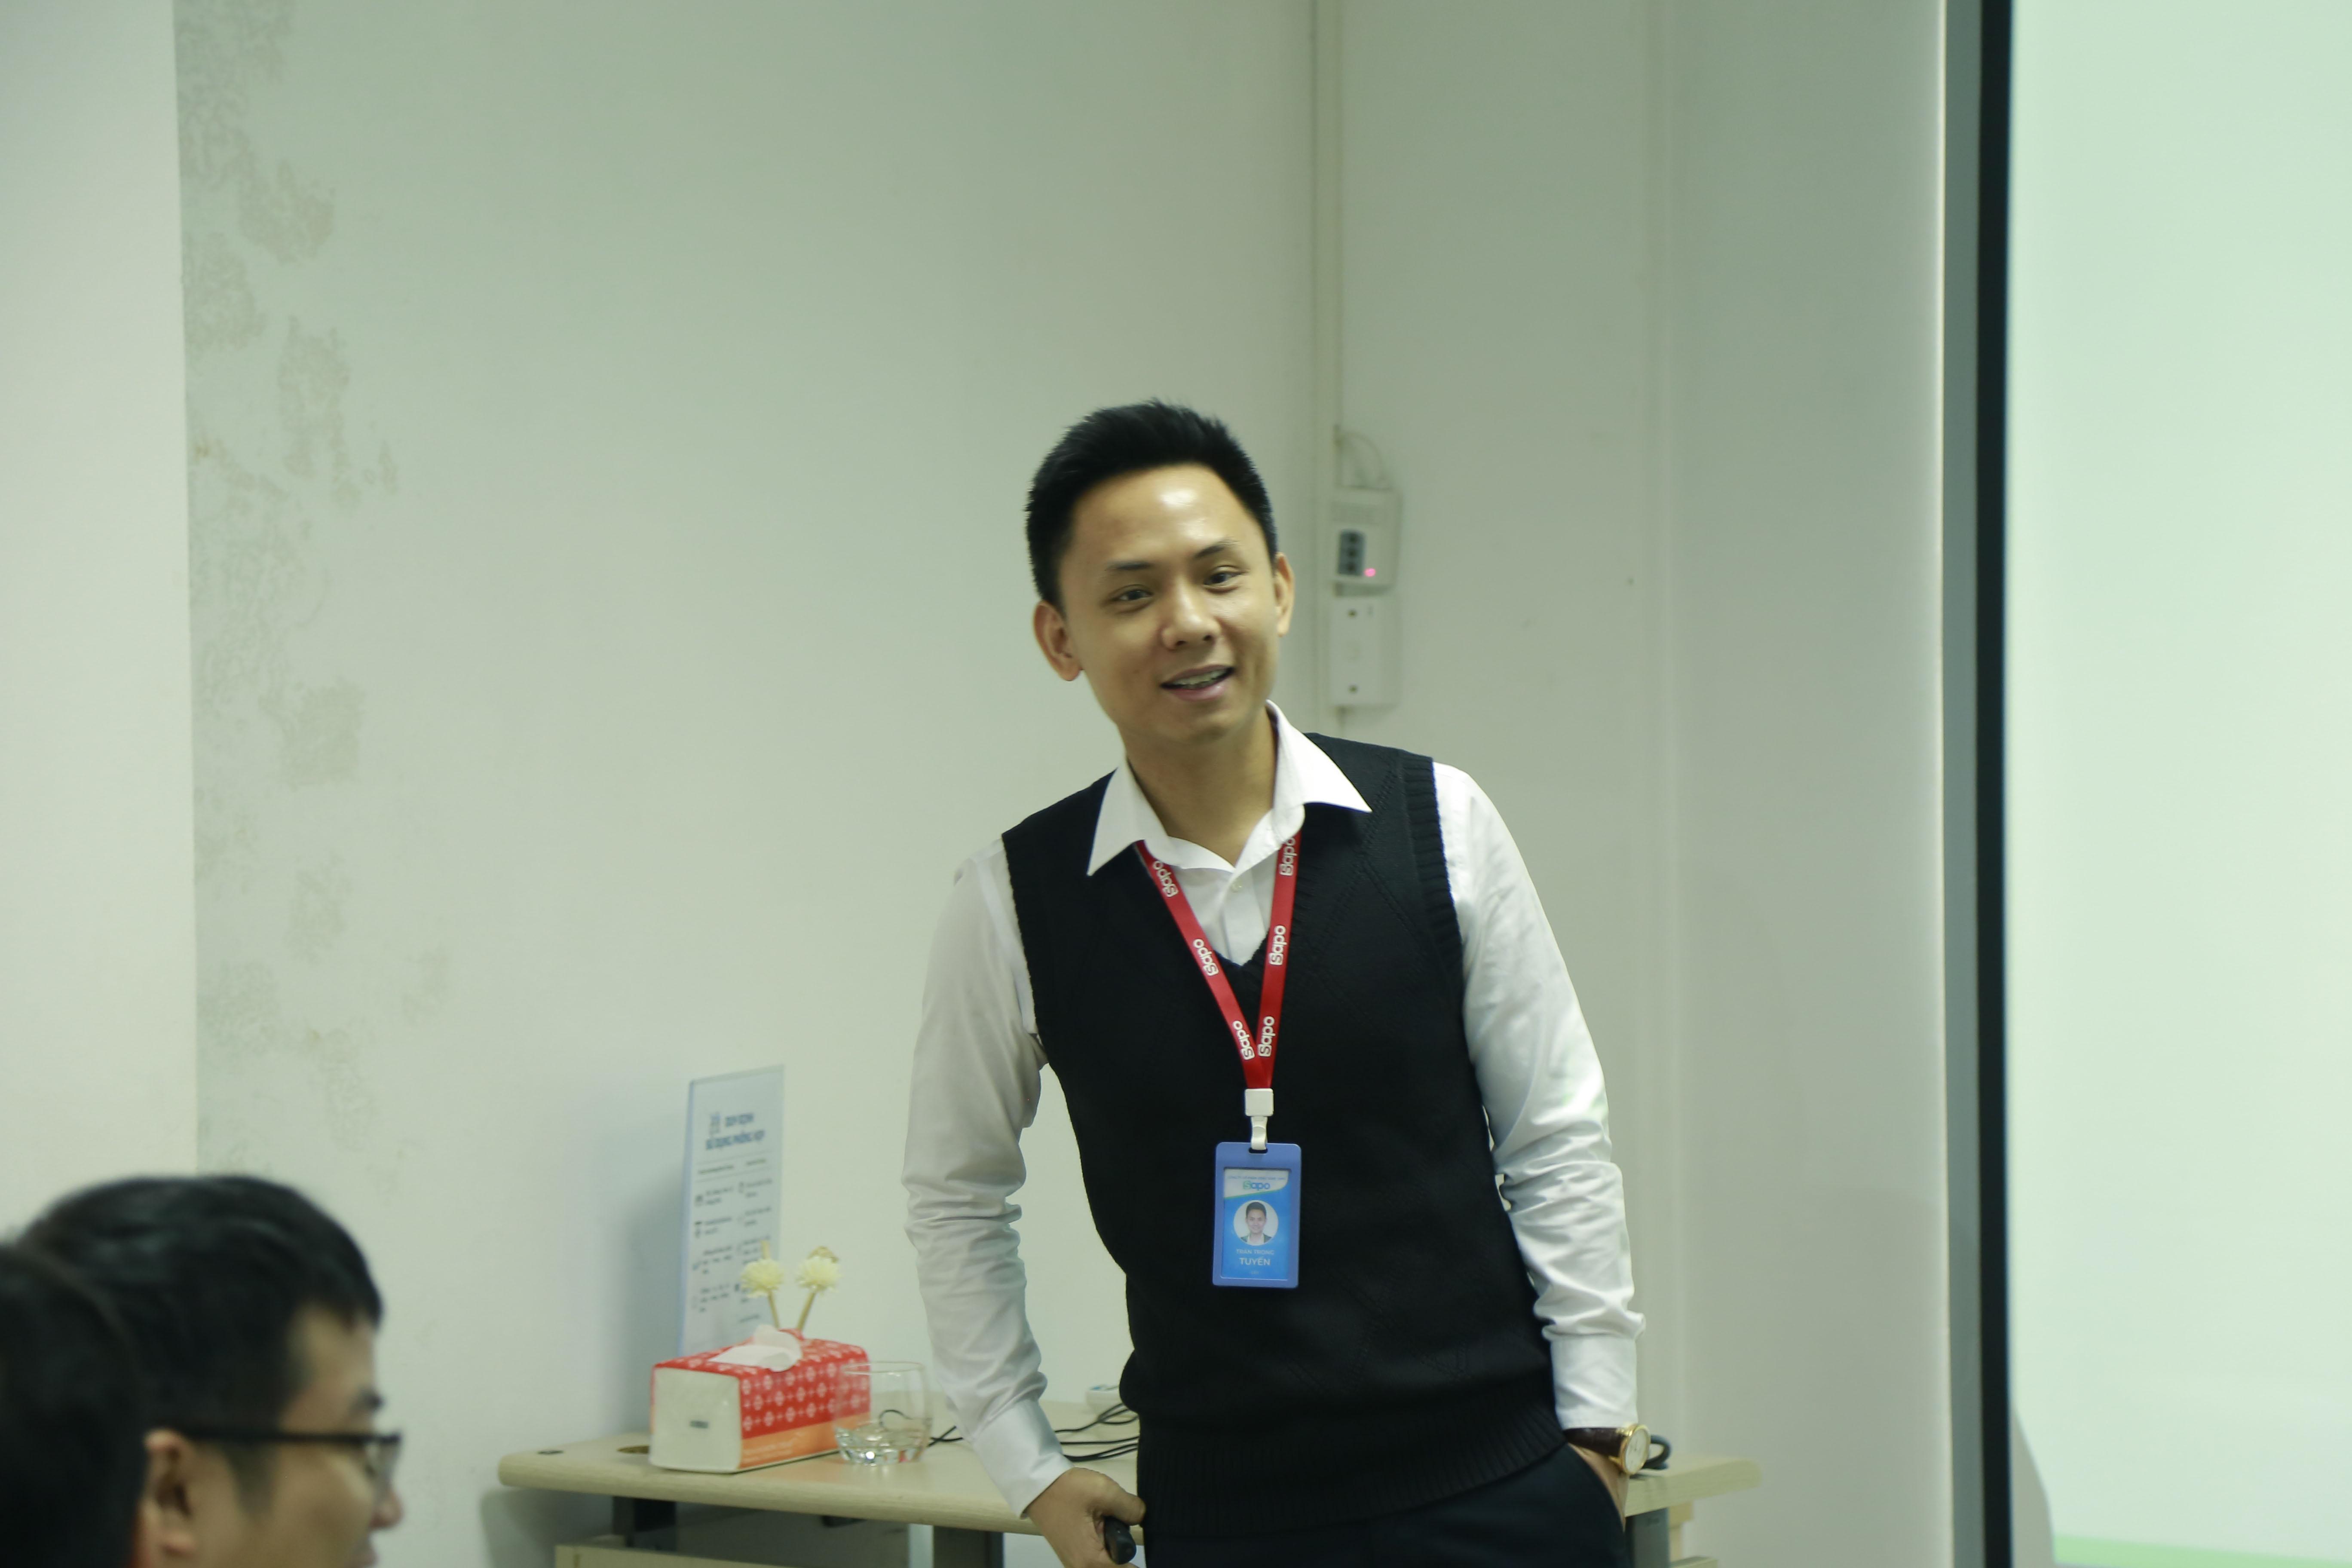 Khối CN&PTSP - Leader Talk chủ đề